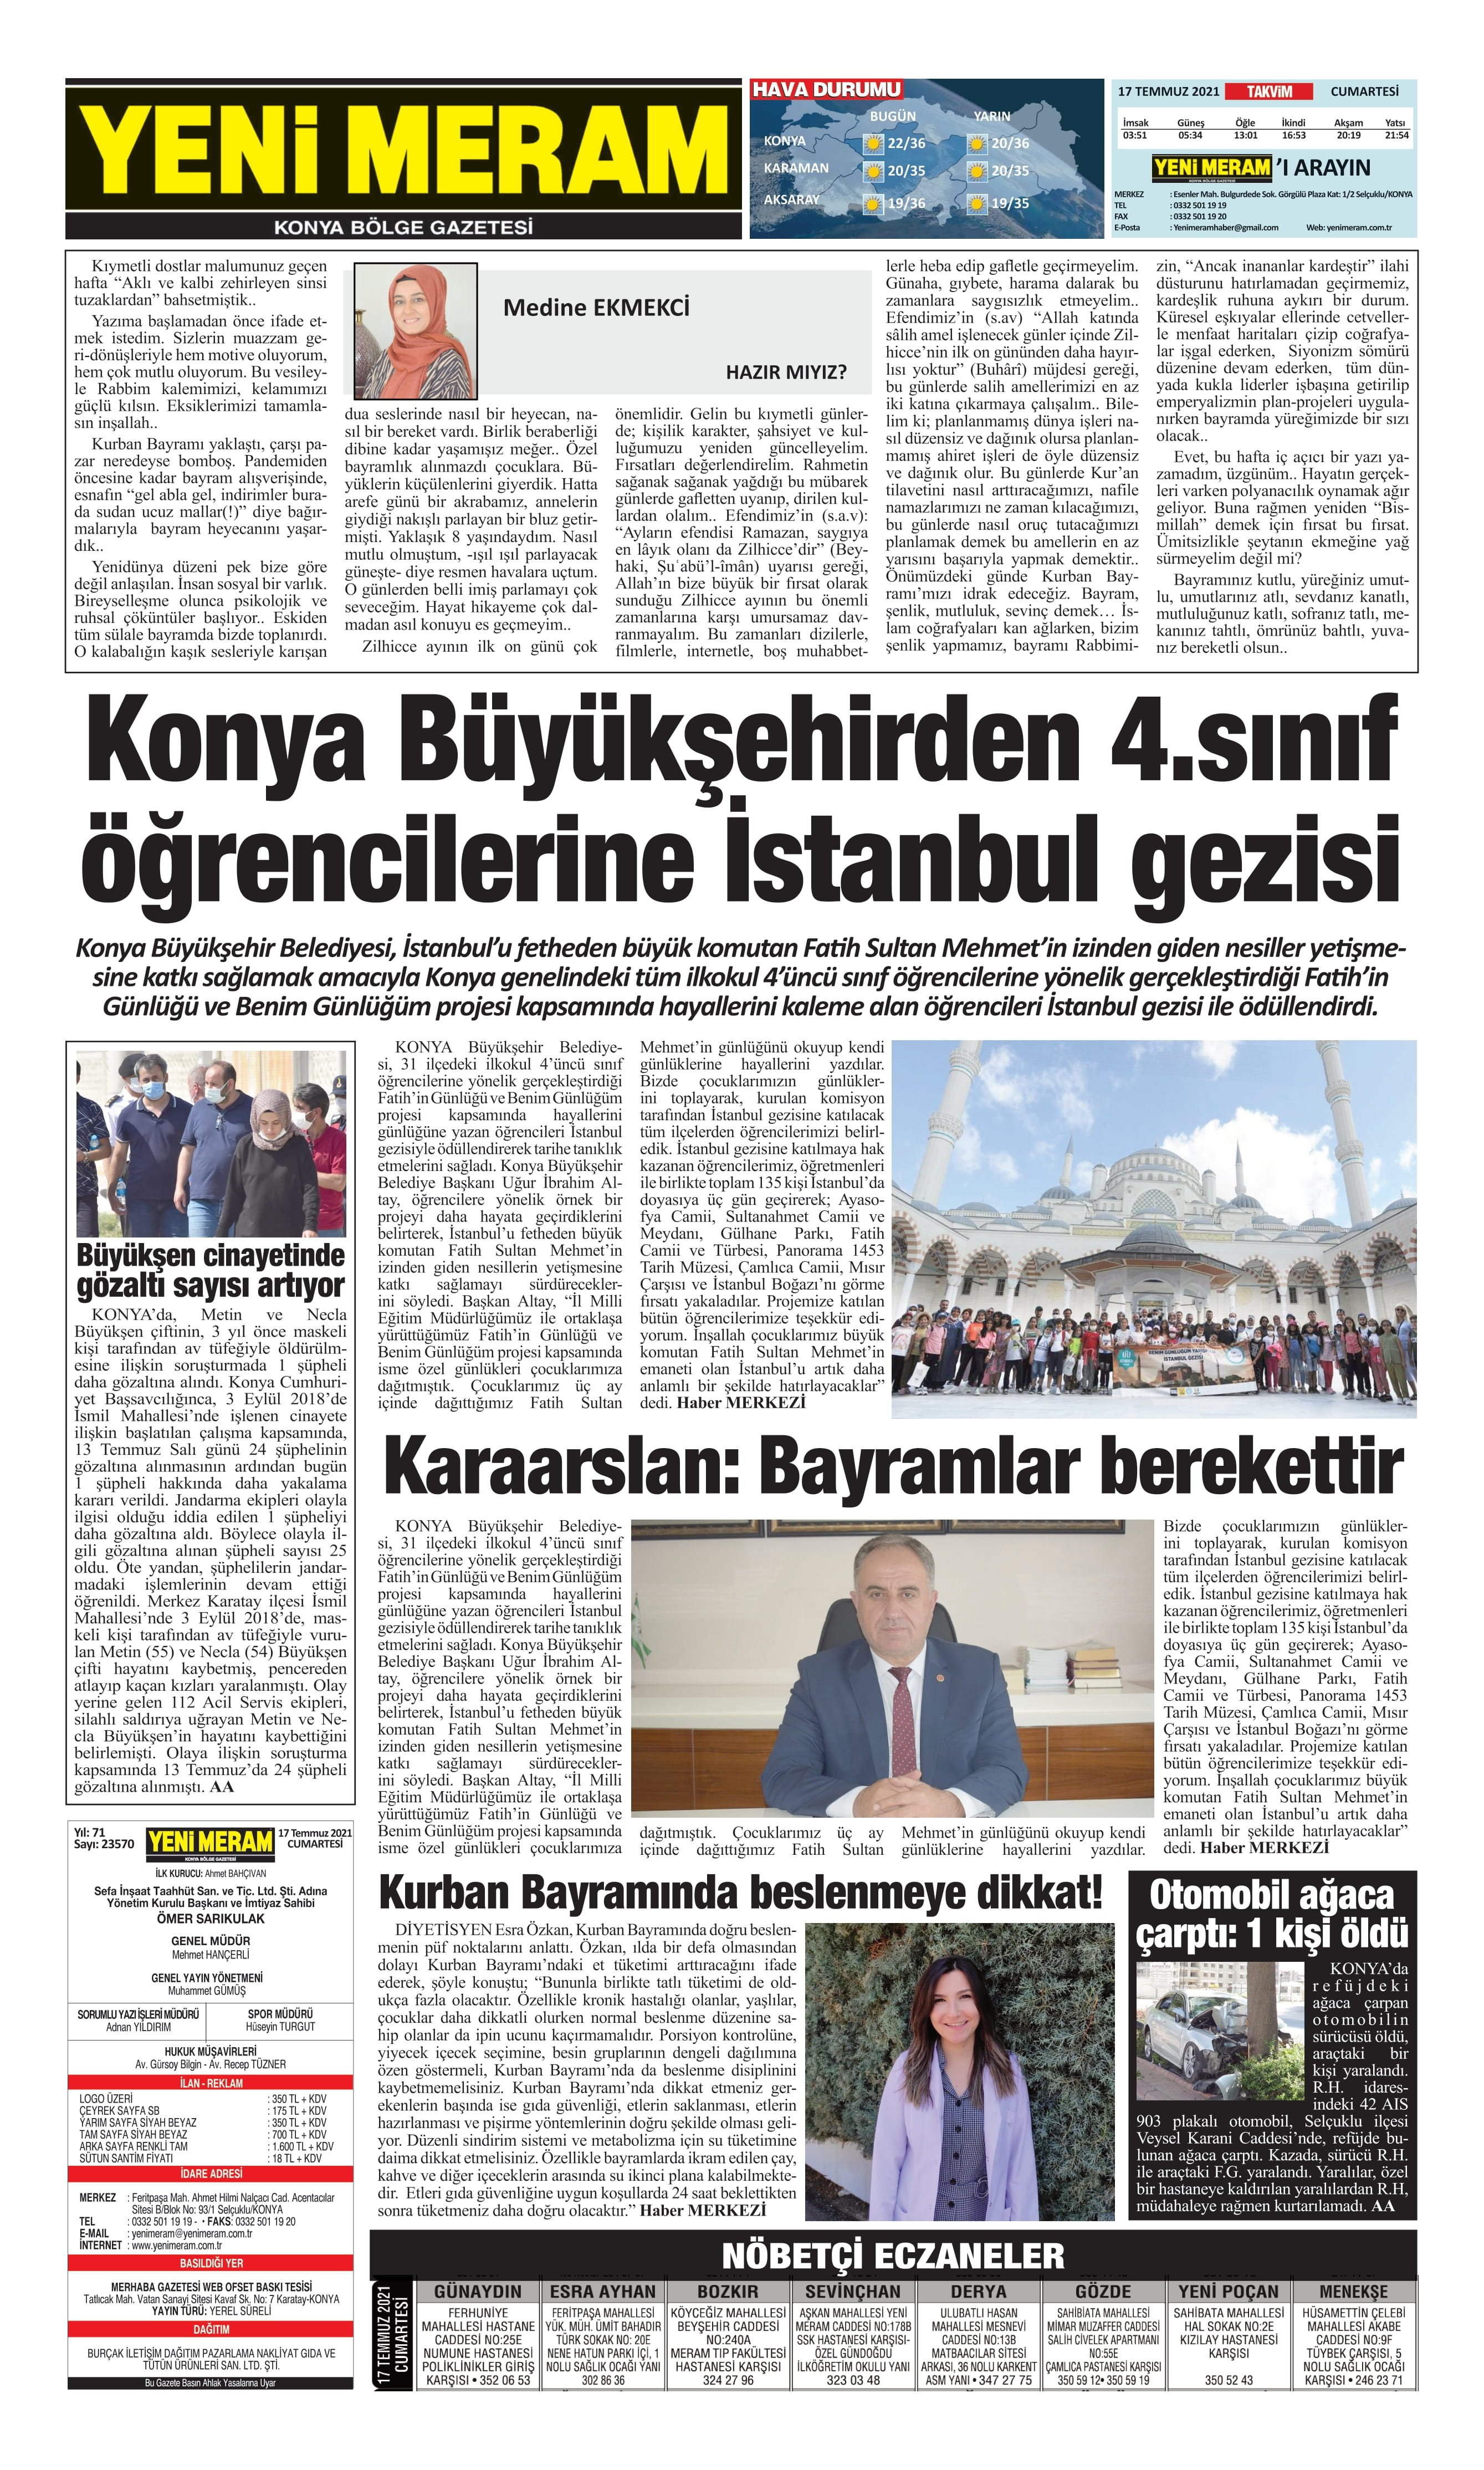 17 Temmuz 2021 Yeni Meram Gazetesi